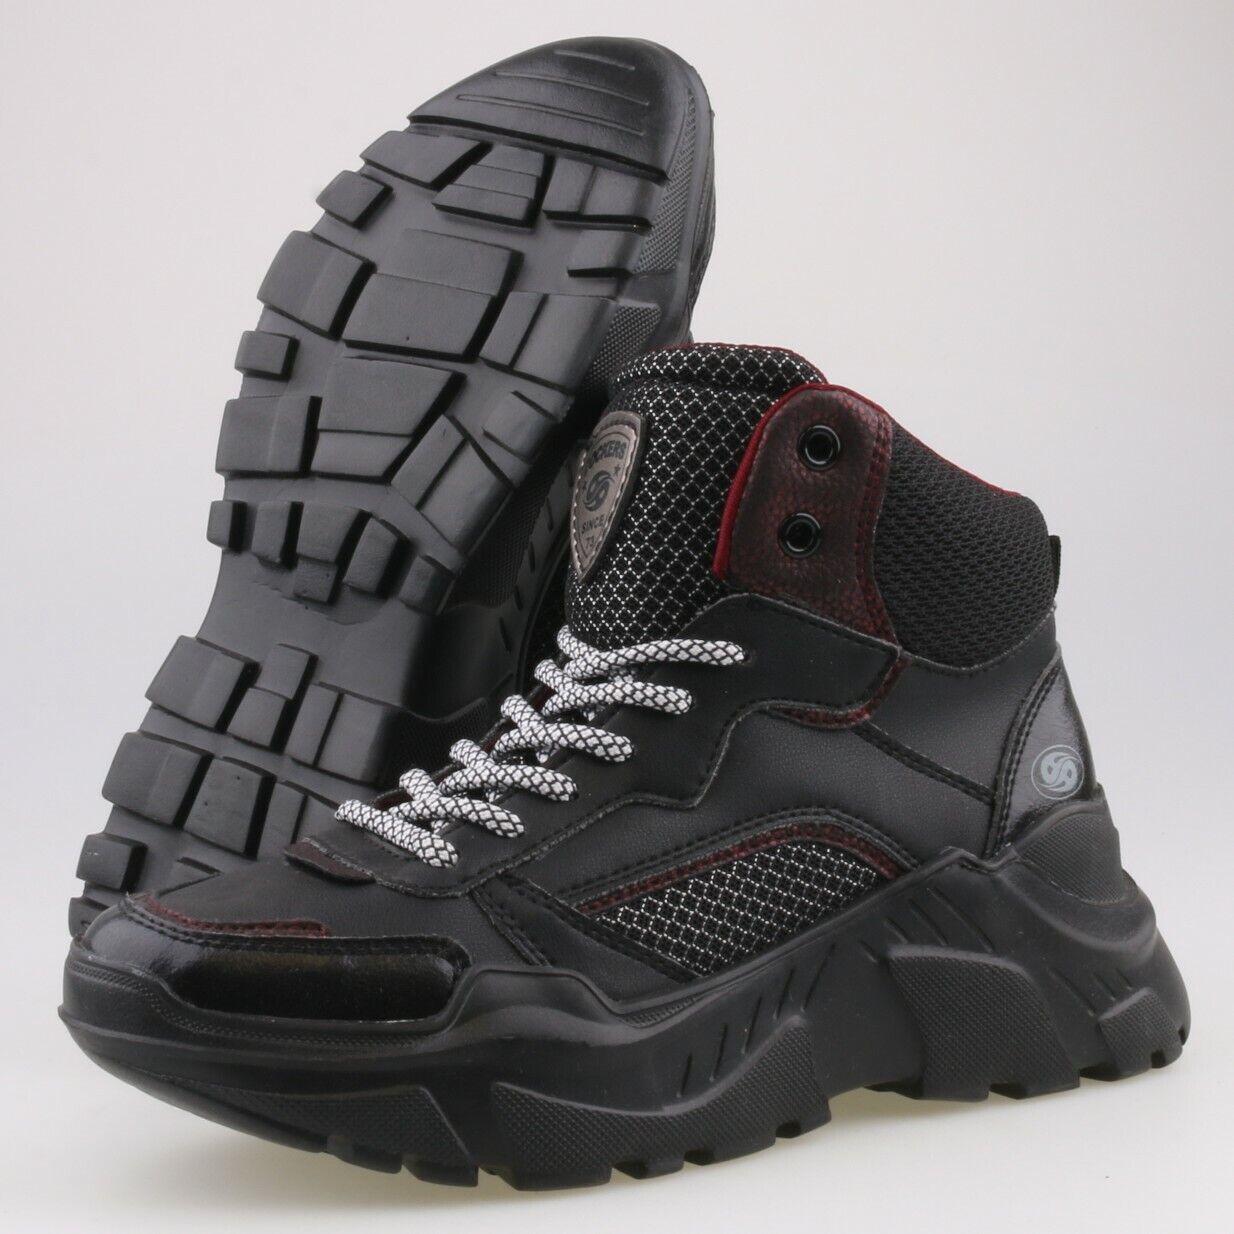 5032-NEU DOCKERS Damenschuhe Gr 36 Schuhe Stiefel Sneaker Plateau Schnürer